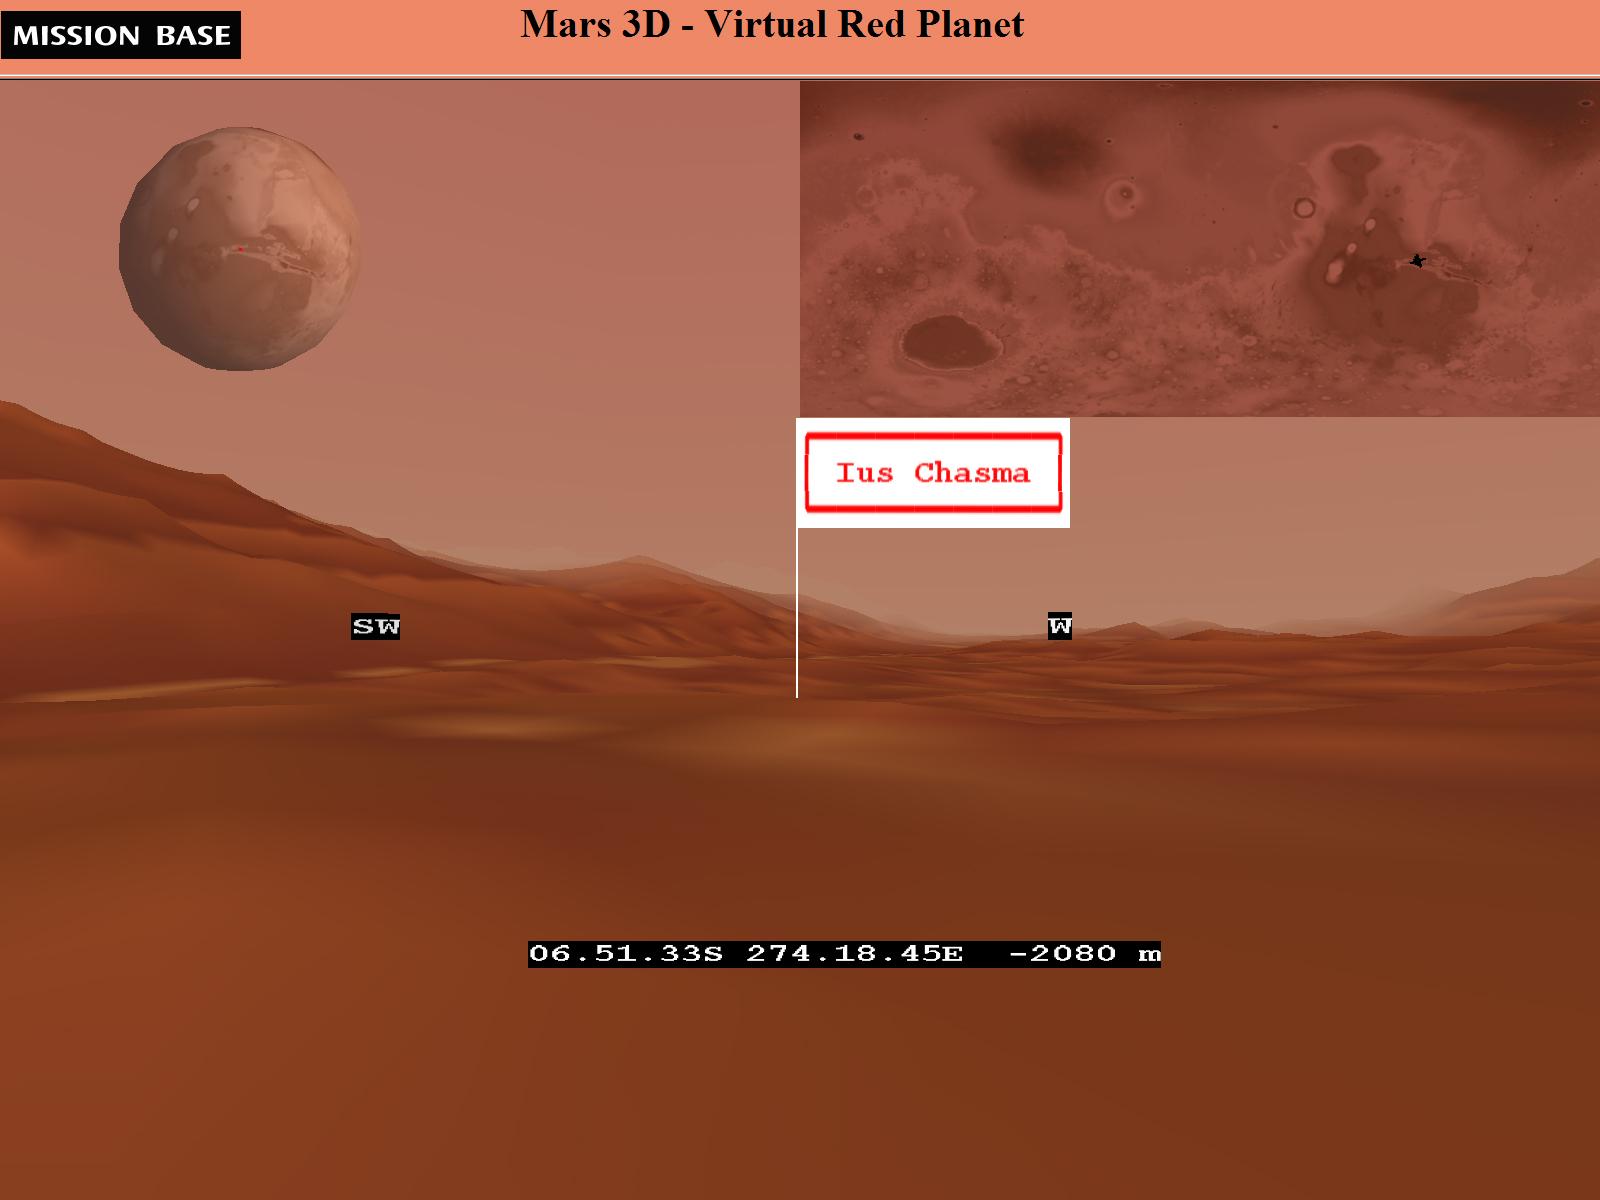 Mars 3D - Virtual Red Planet